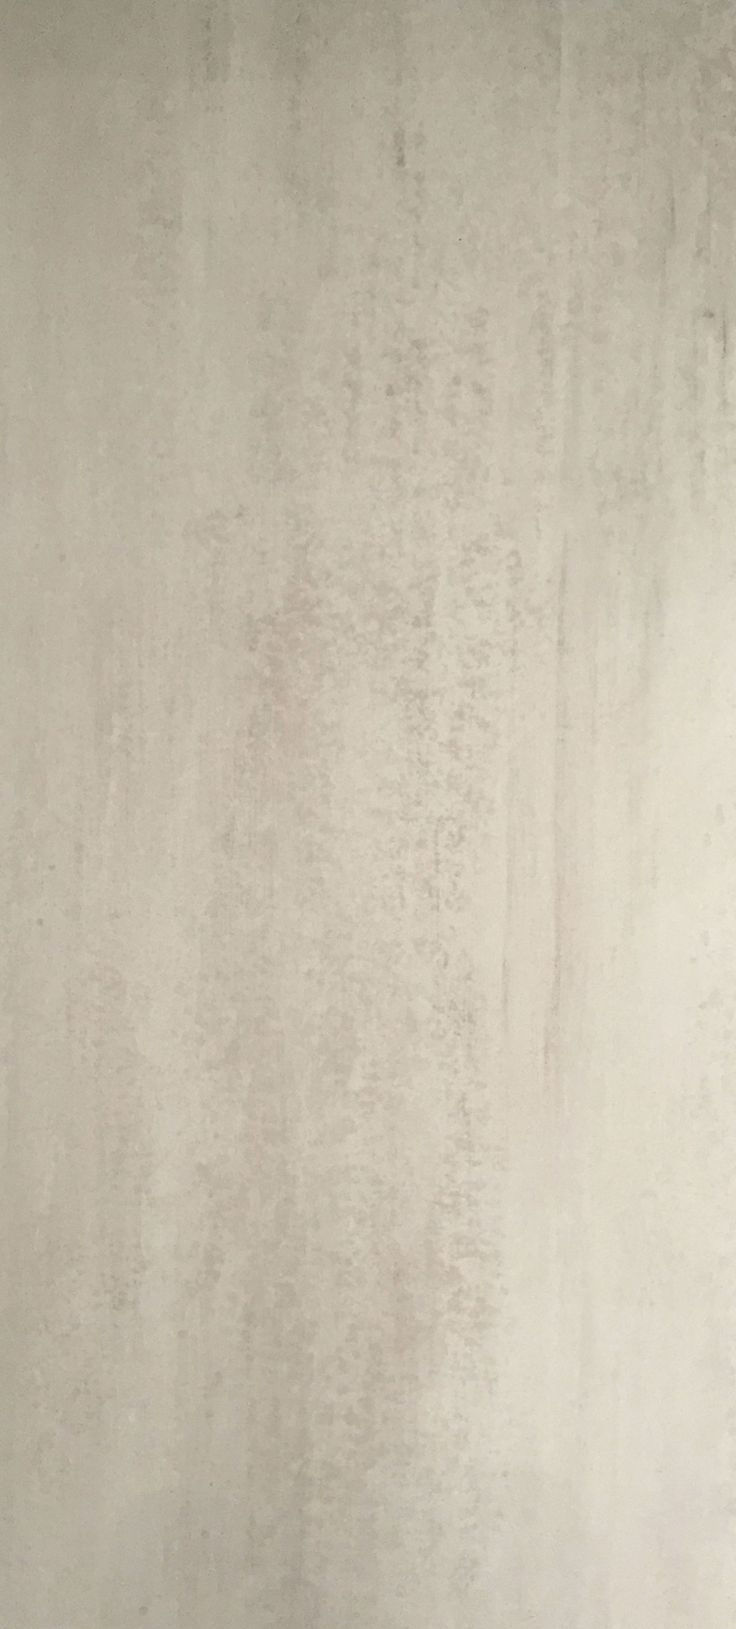 Personal Selection Bathroom Floor or Wall Tile - Mark Gypsum Lap